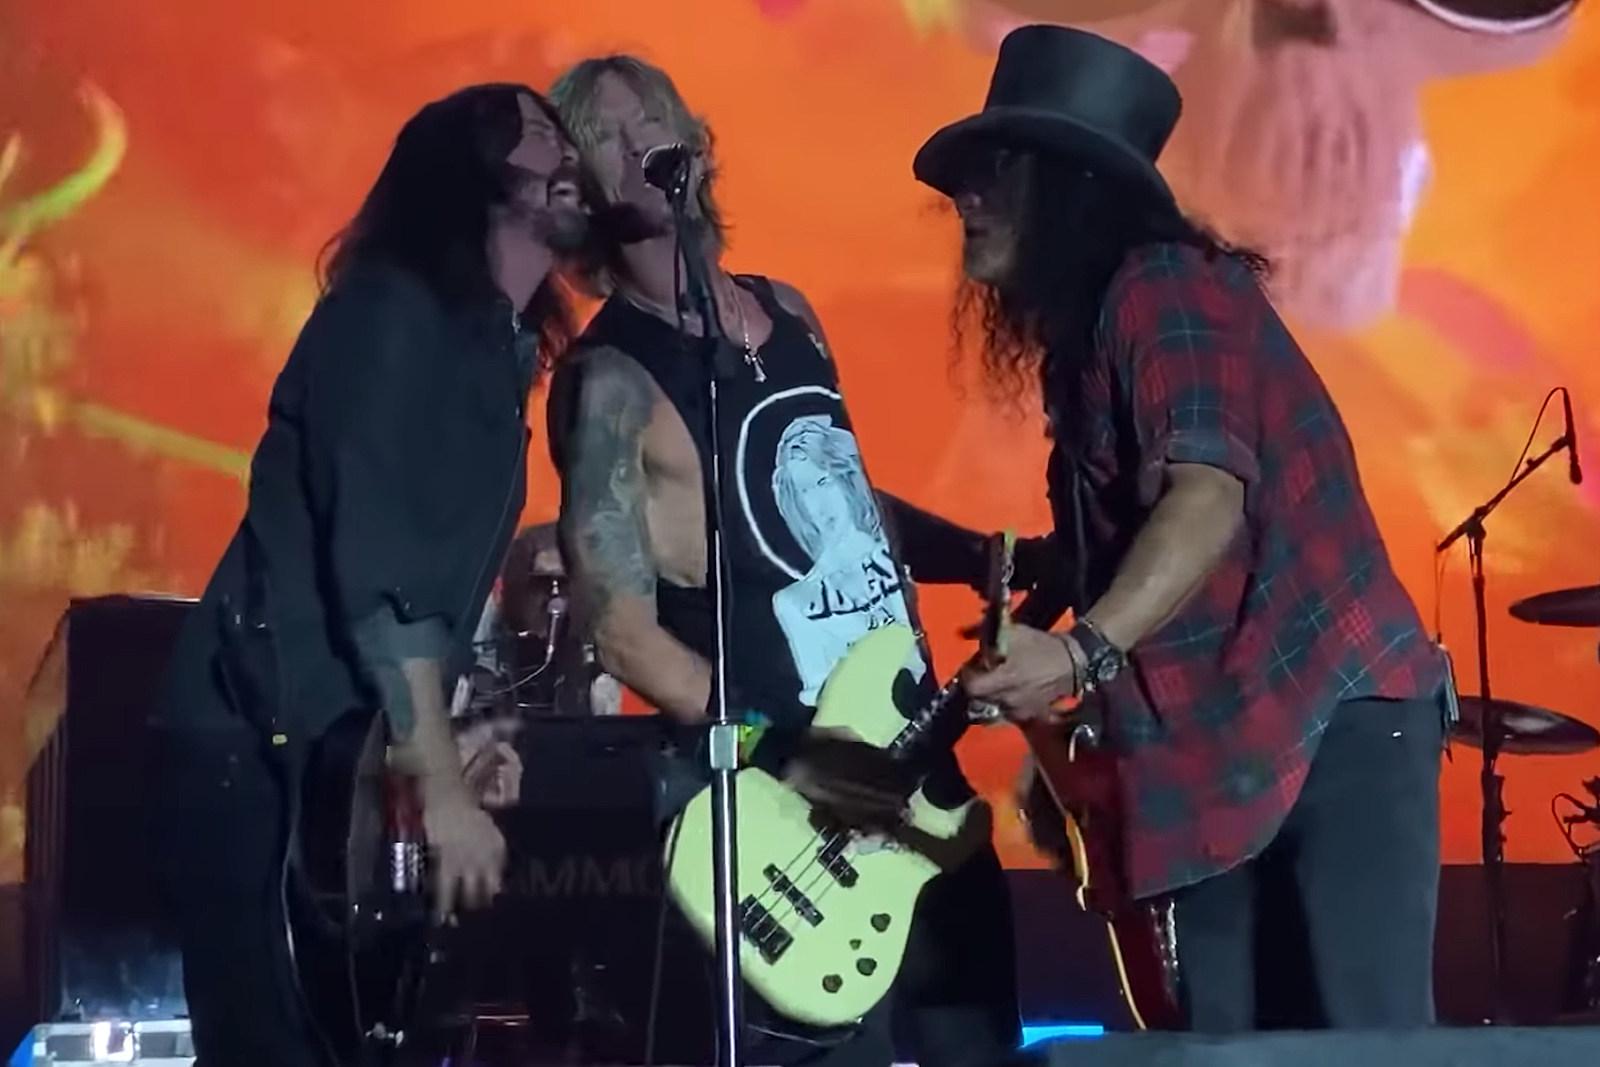 Guns' N' Roses Get Cut Off During BottleRock Festival Performance